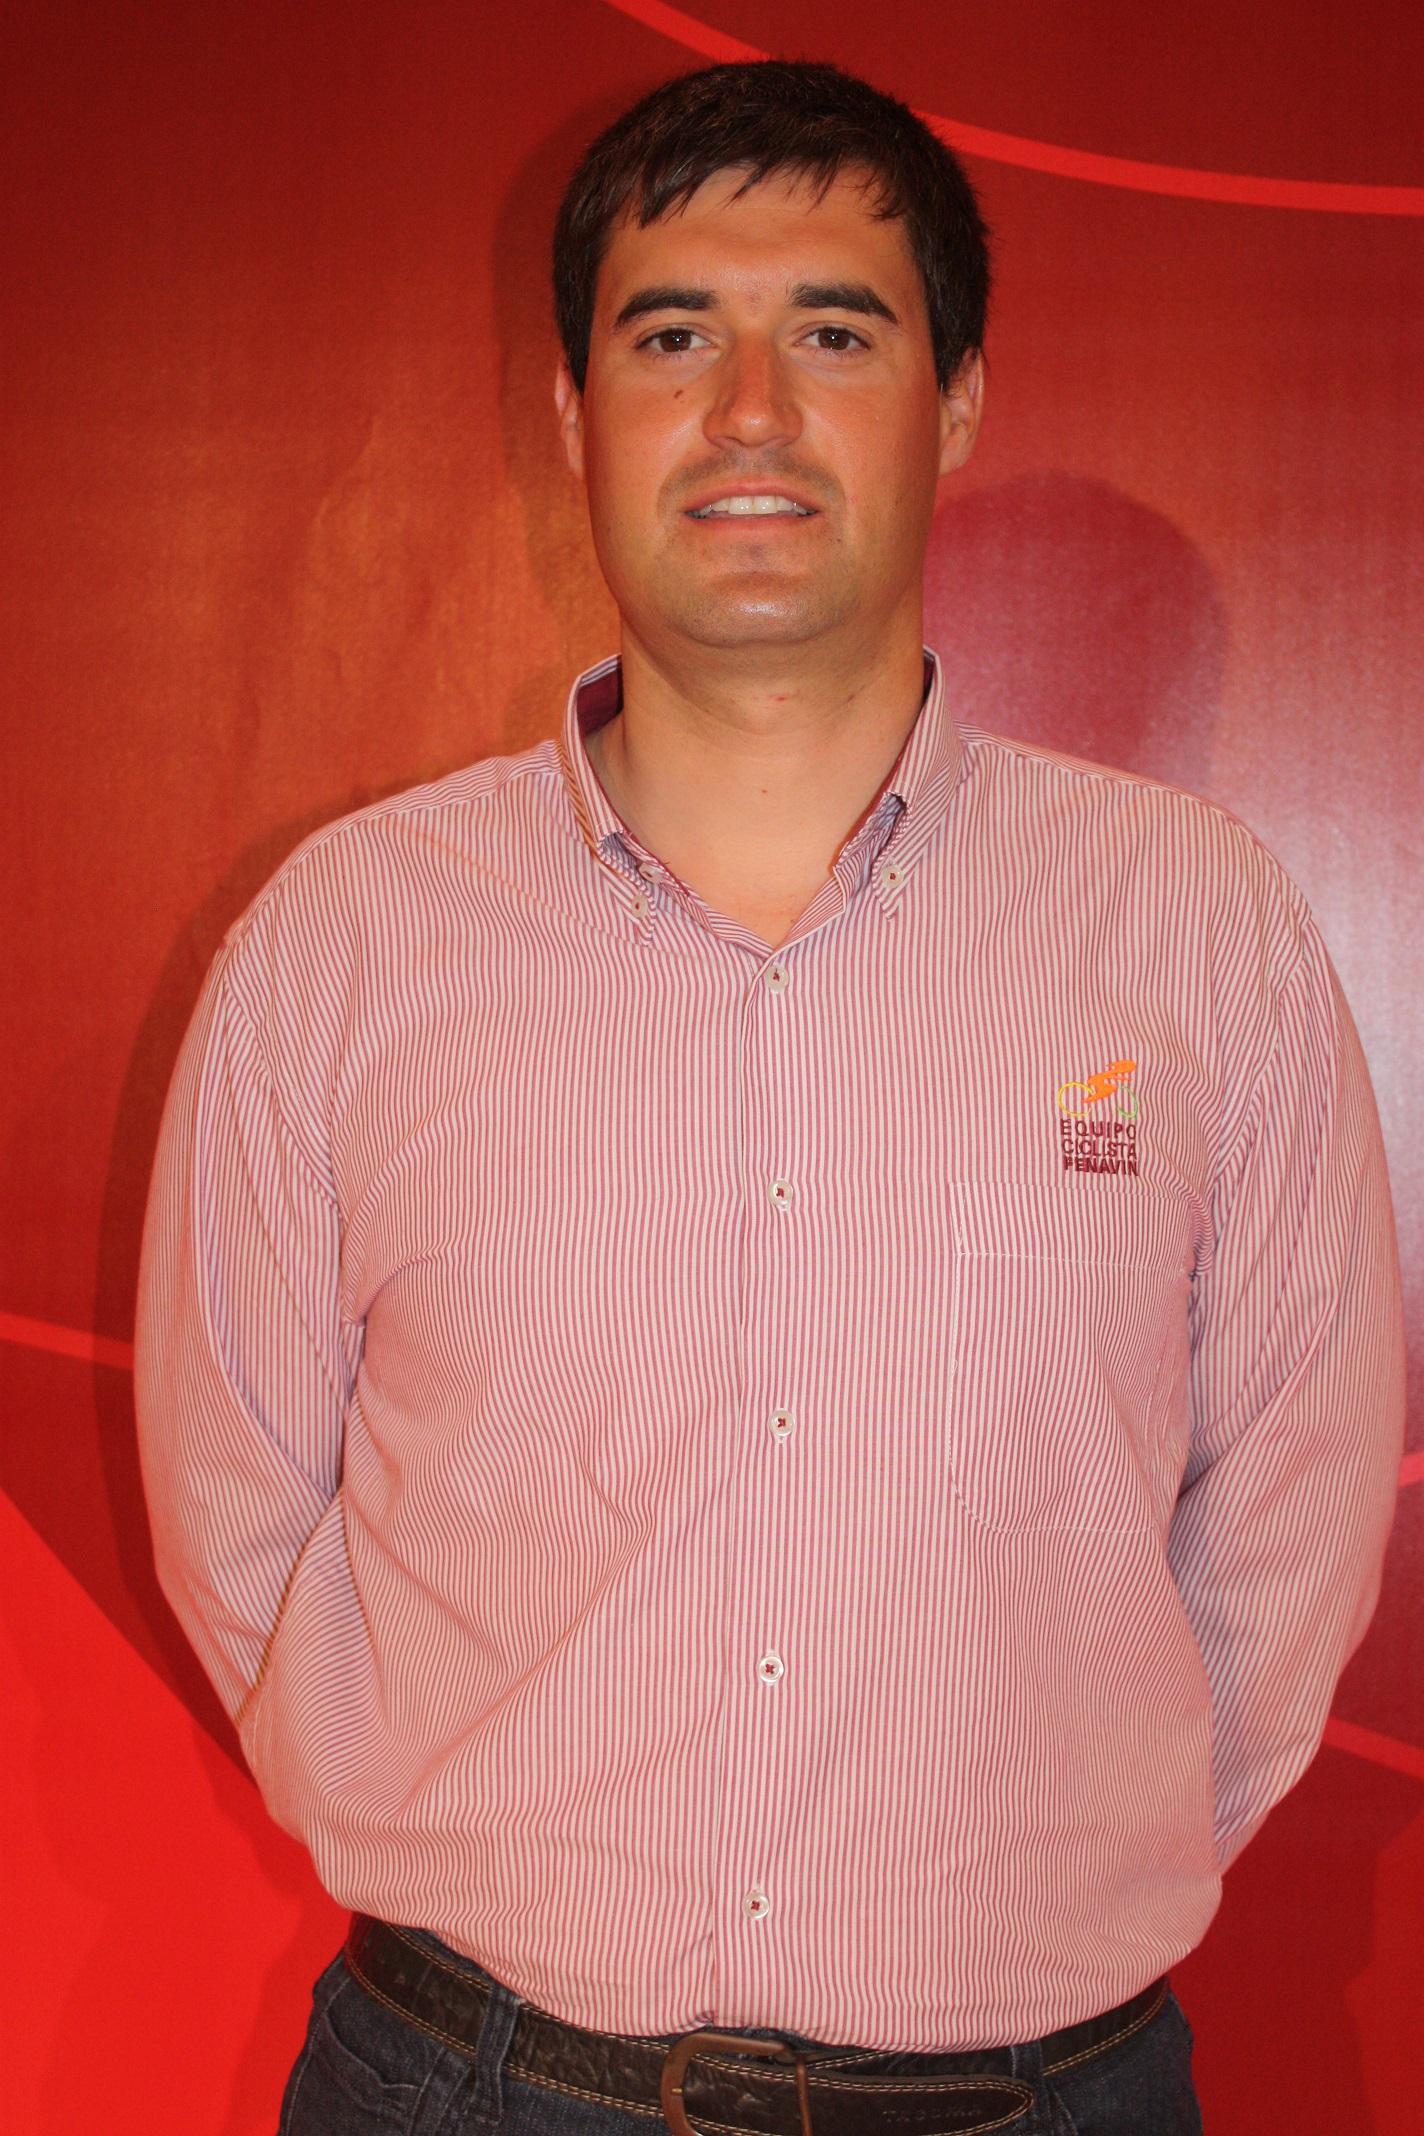 Raúl Rodrigo